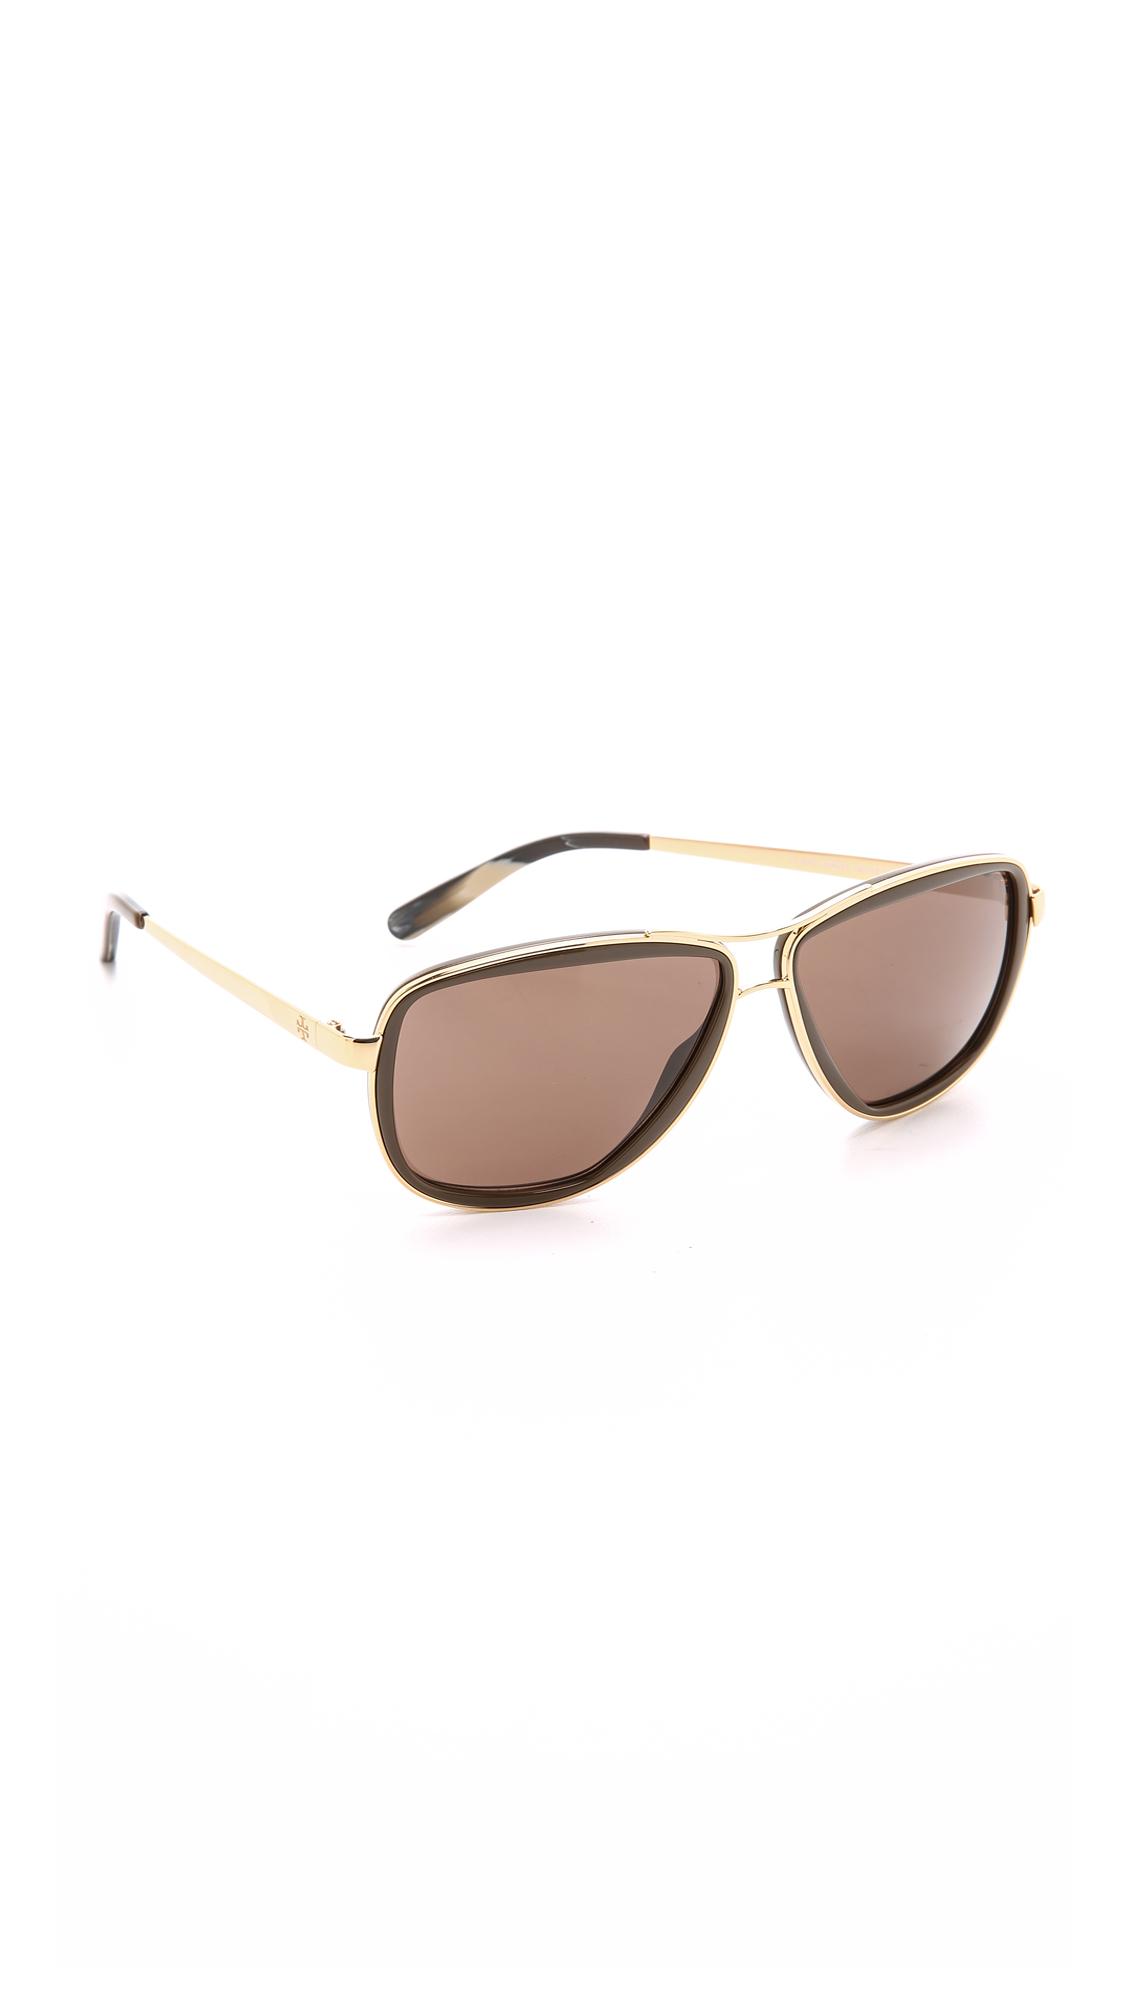 Tory Burch Modern Stacked Sunglasses - Gold Brown/Smoke